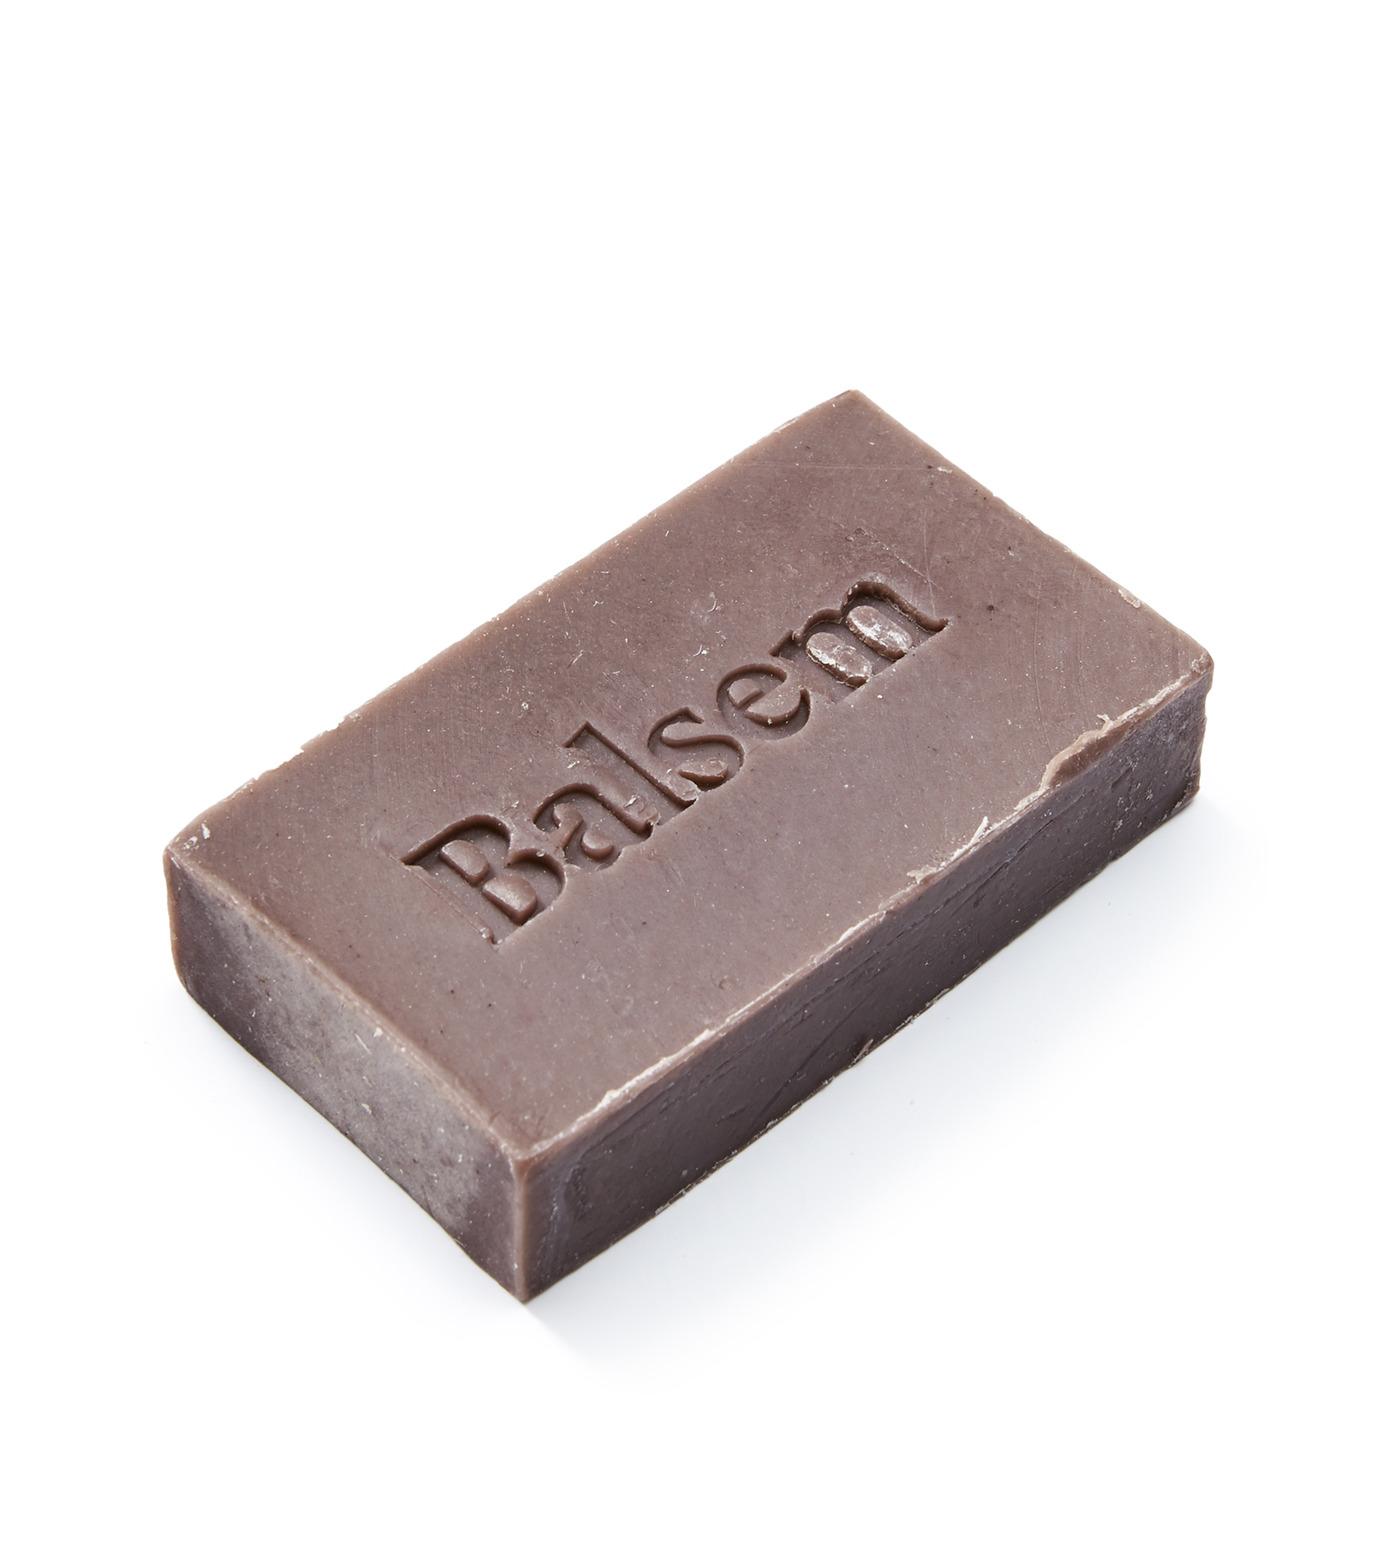 BALSEM()のBAR SOAP S/T 180g-WHITE(BATH-BODY-GROOMING/BATH-BODY-GROOMING)-MS-31032B-4 拡大詳細画像1